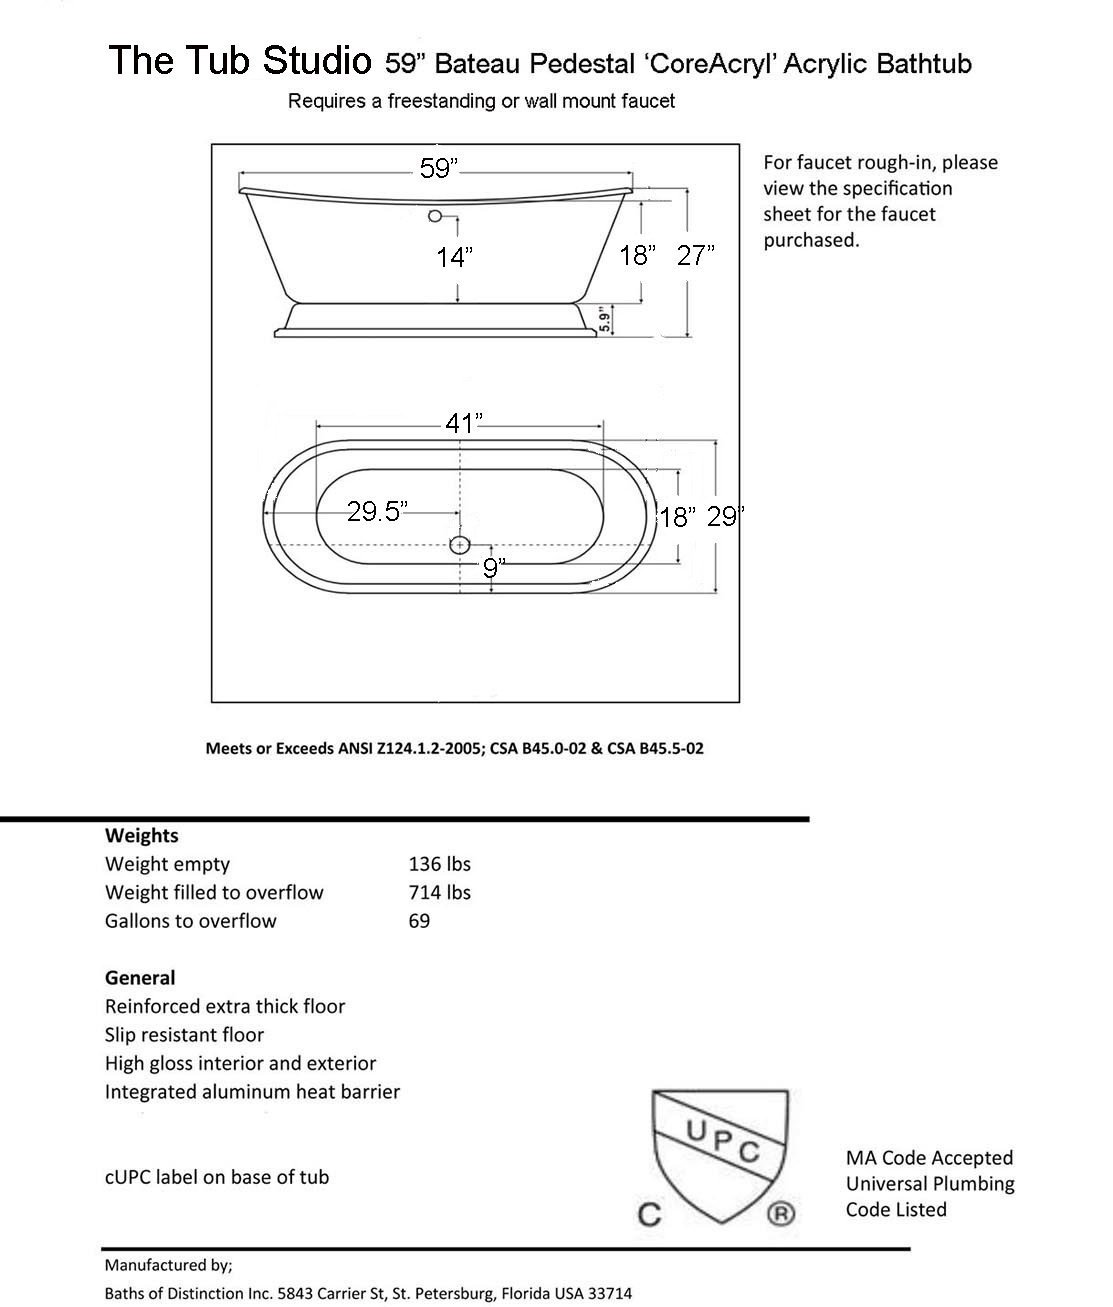 39 isabetta 39 coreacryl acrylic white pedestal tub for Standard size of freestanding bathtub